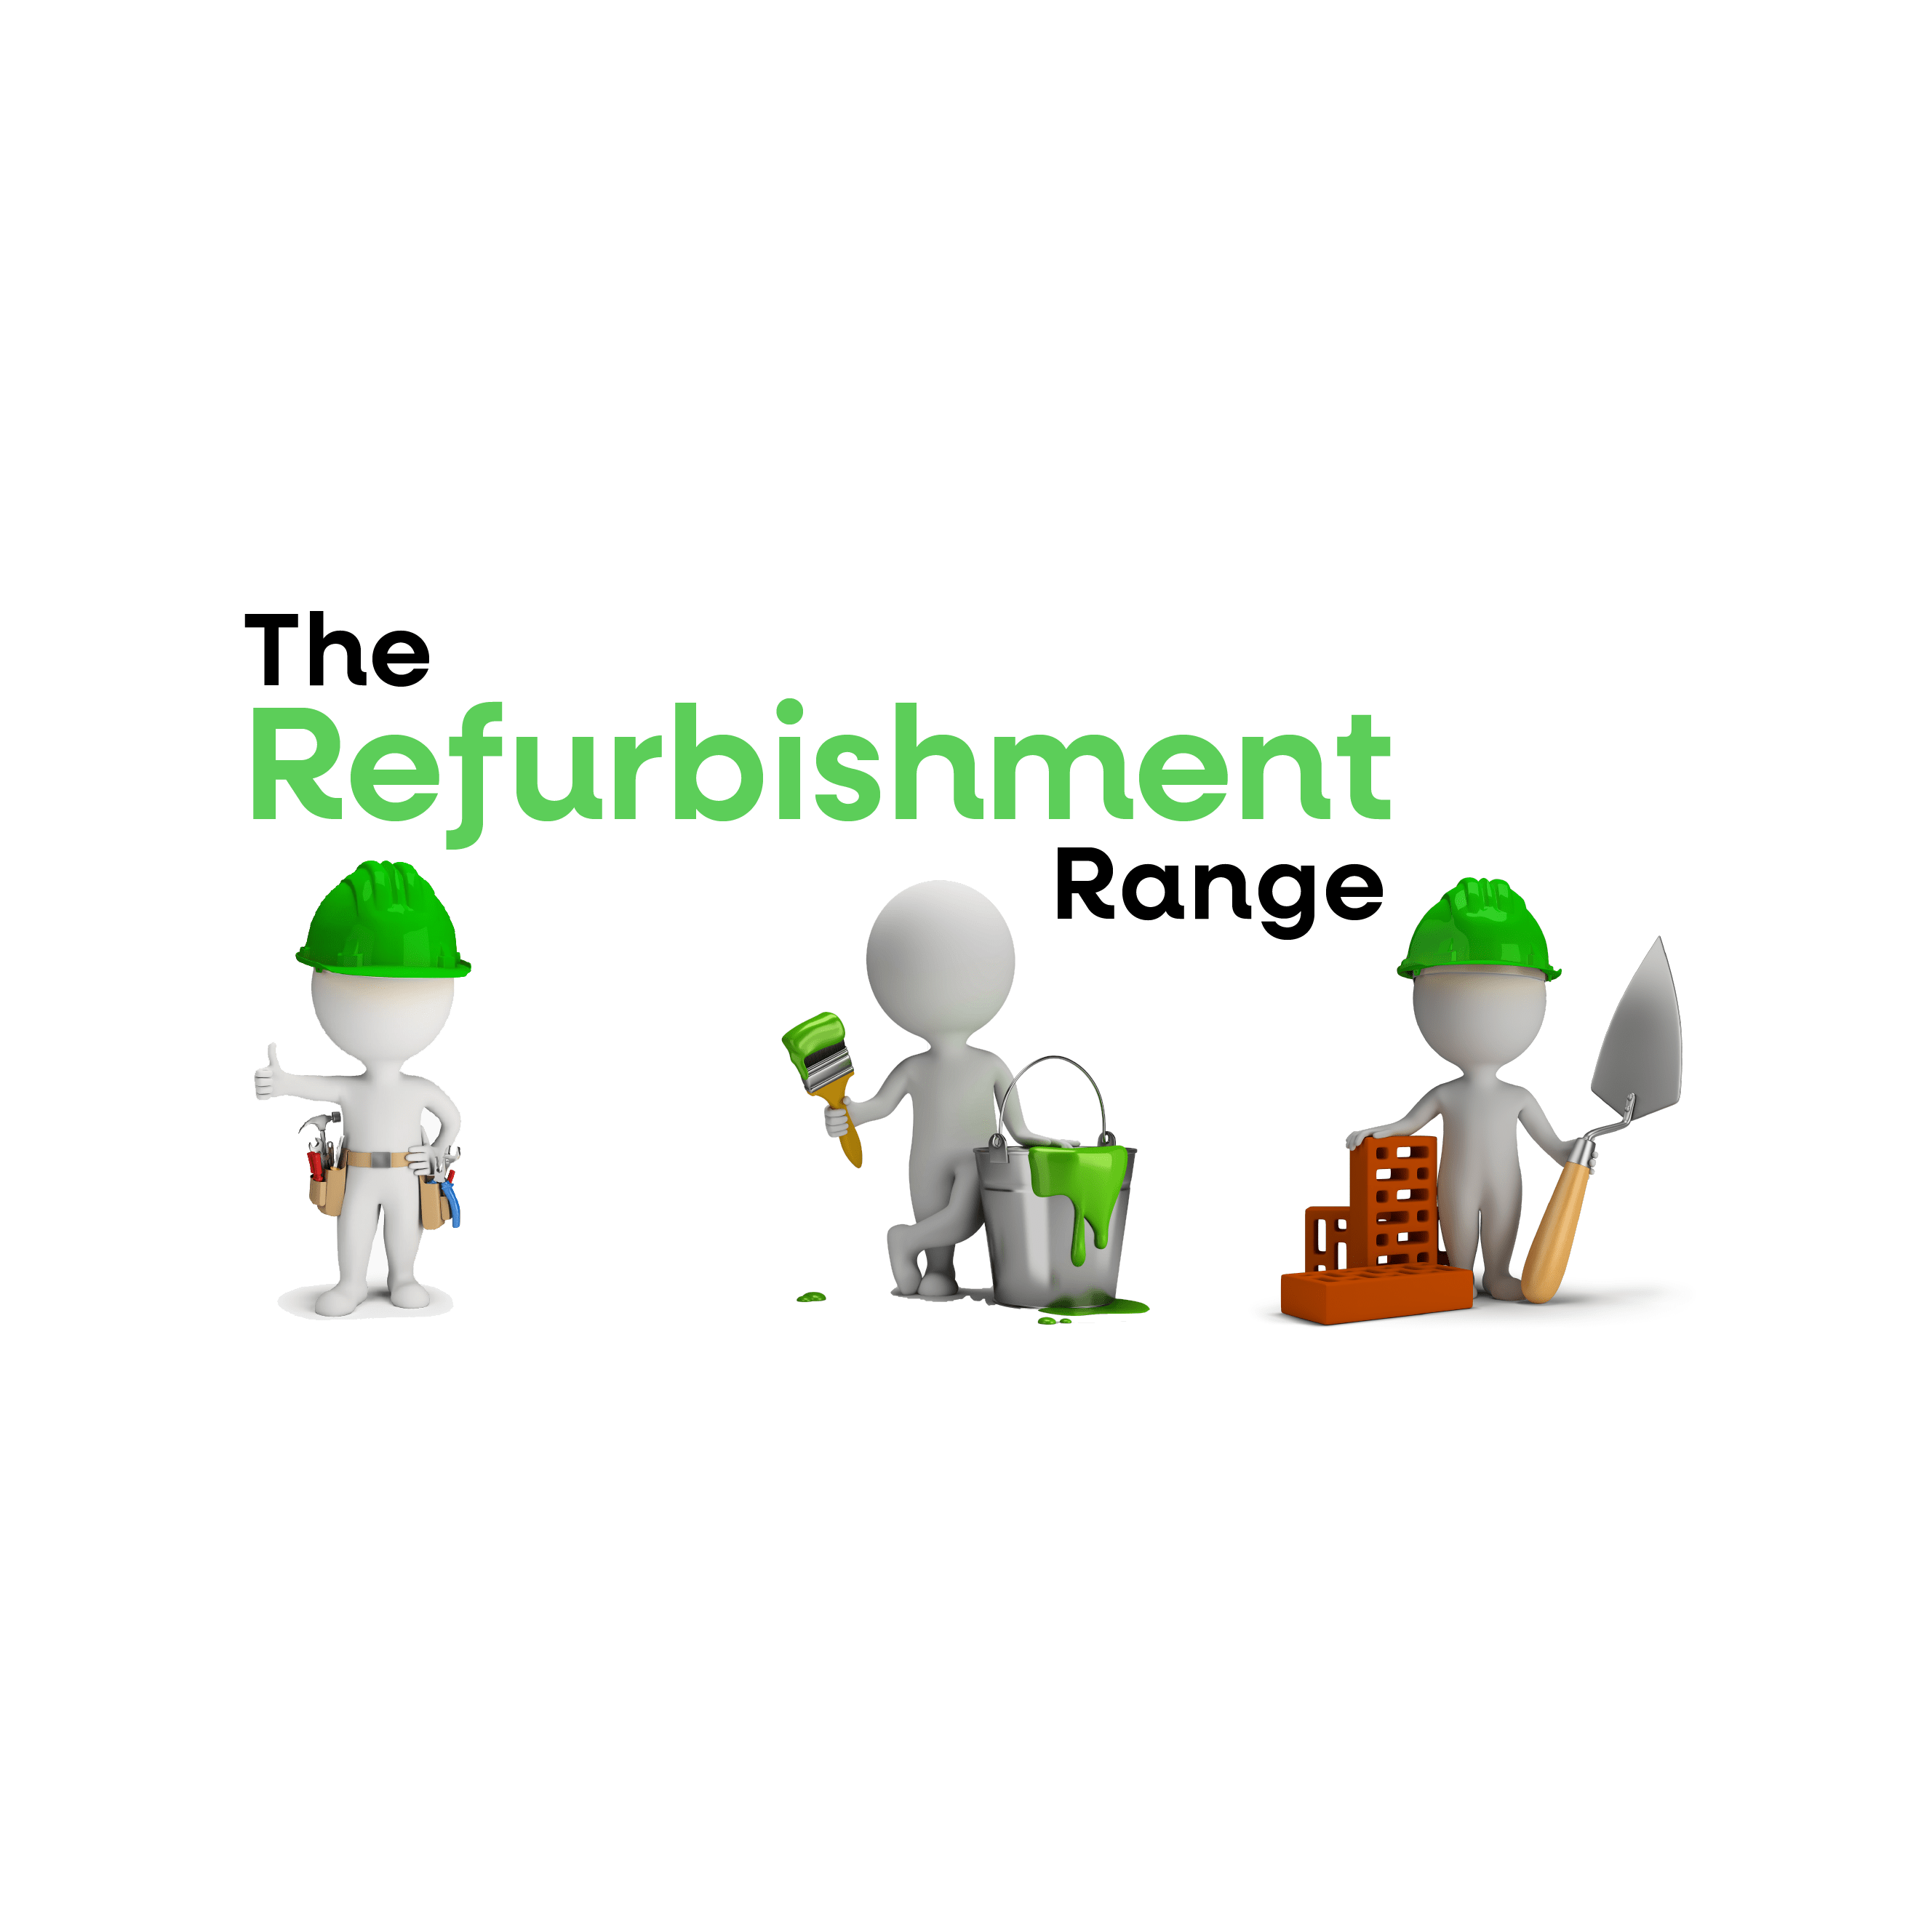 The Refurbishment Range